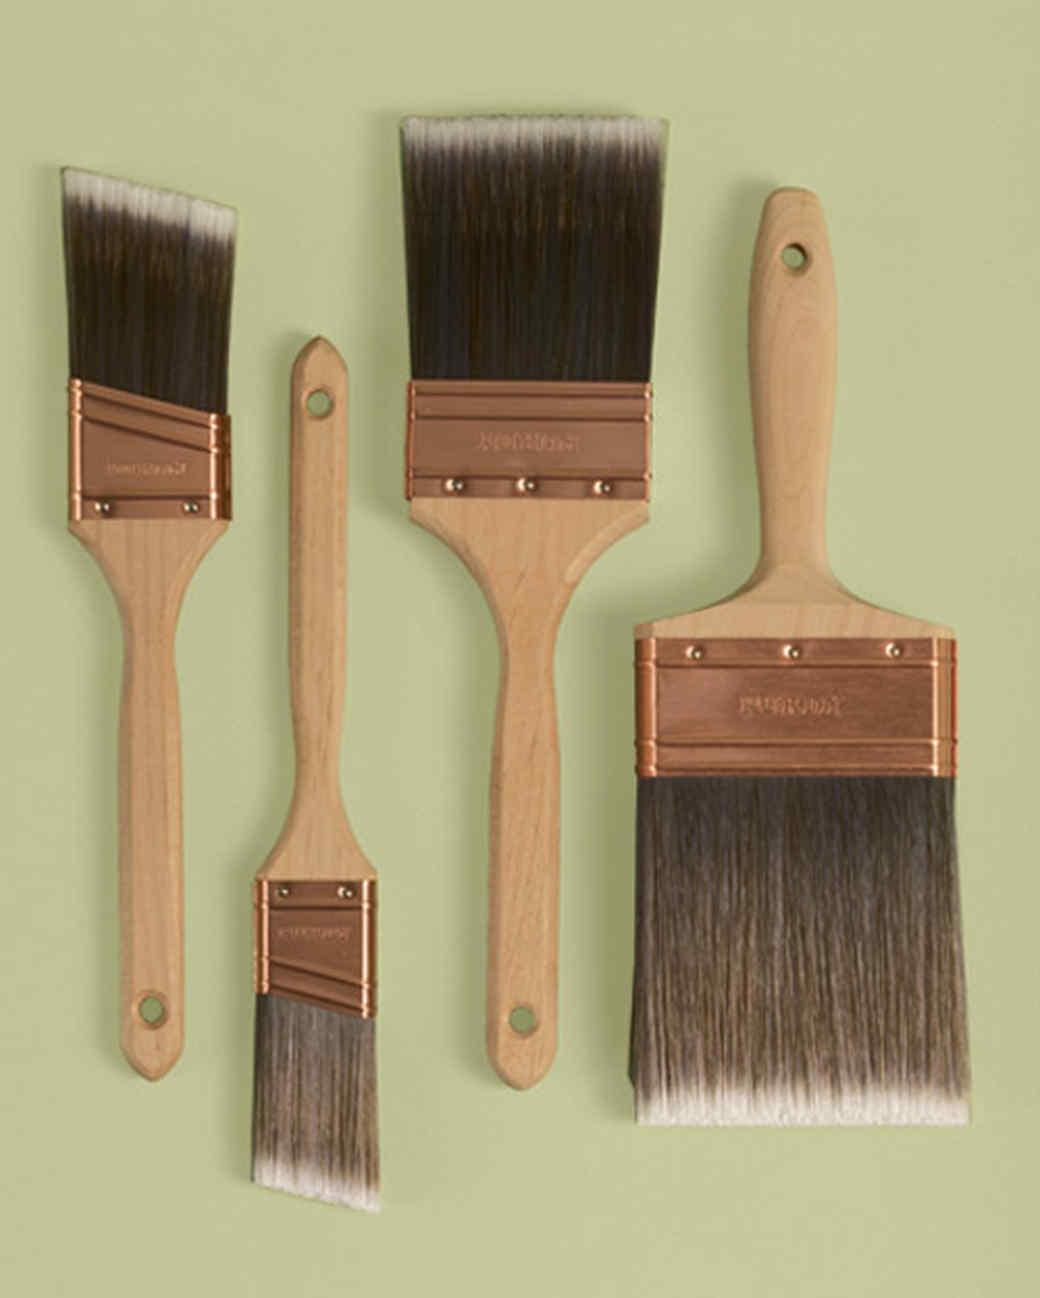 mld101493_0905_brushes1.jpg